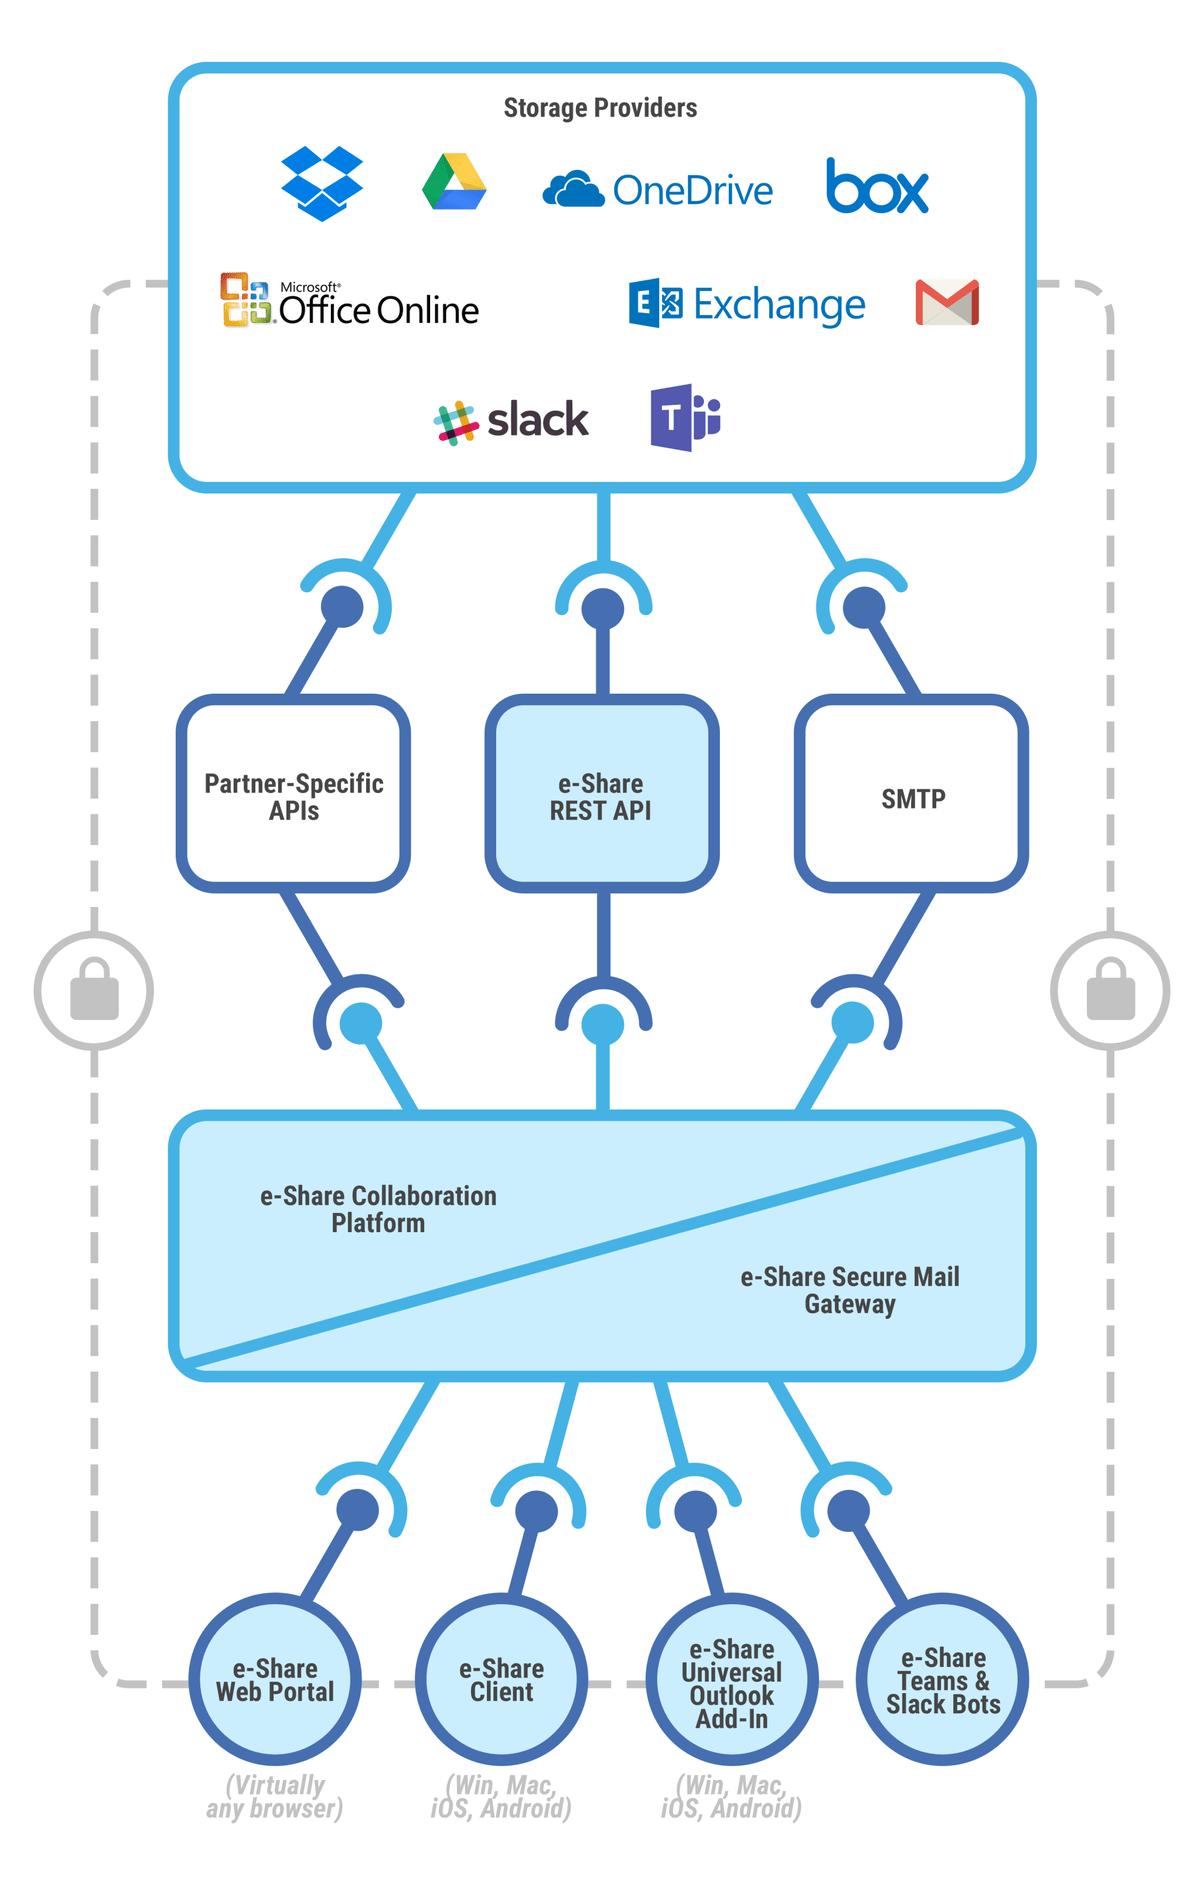 Platform - e-Share us | Secure External Collaboration and